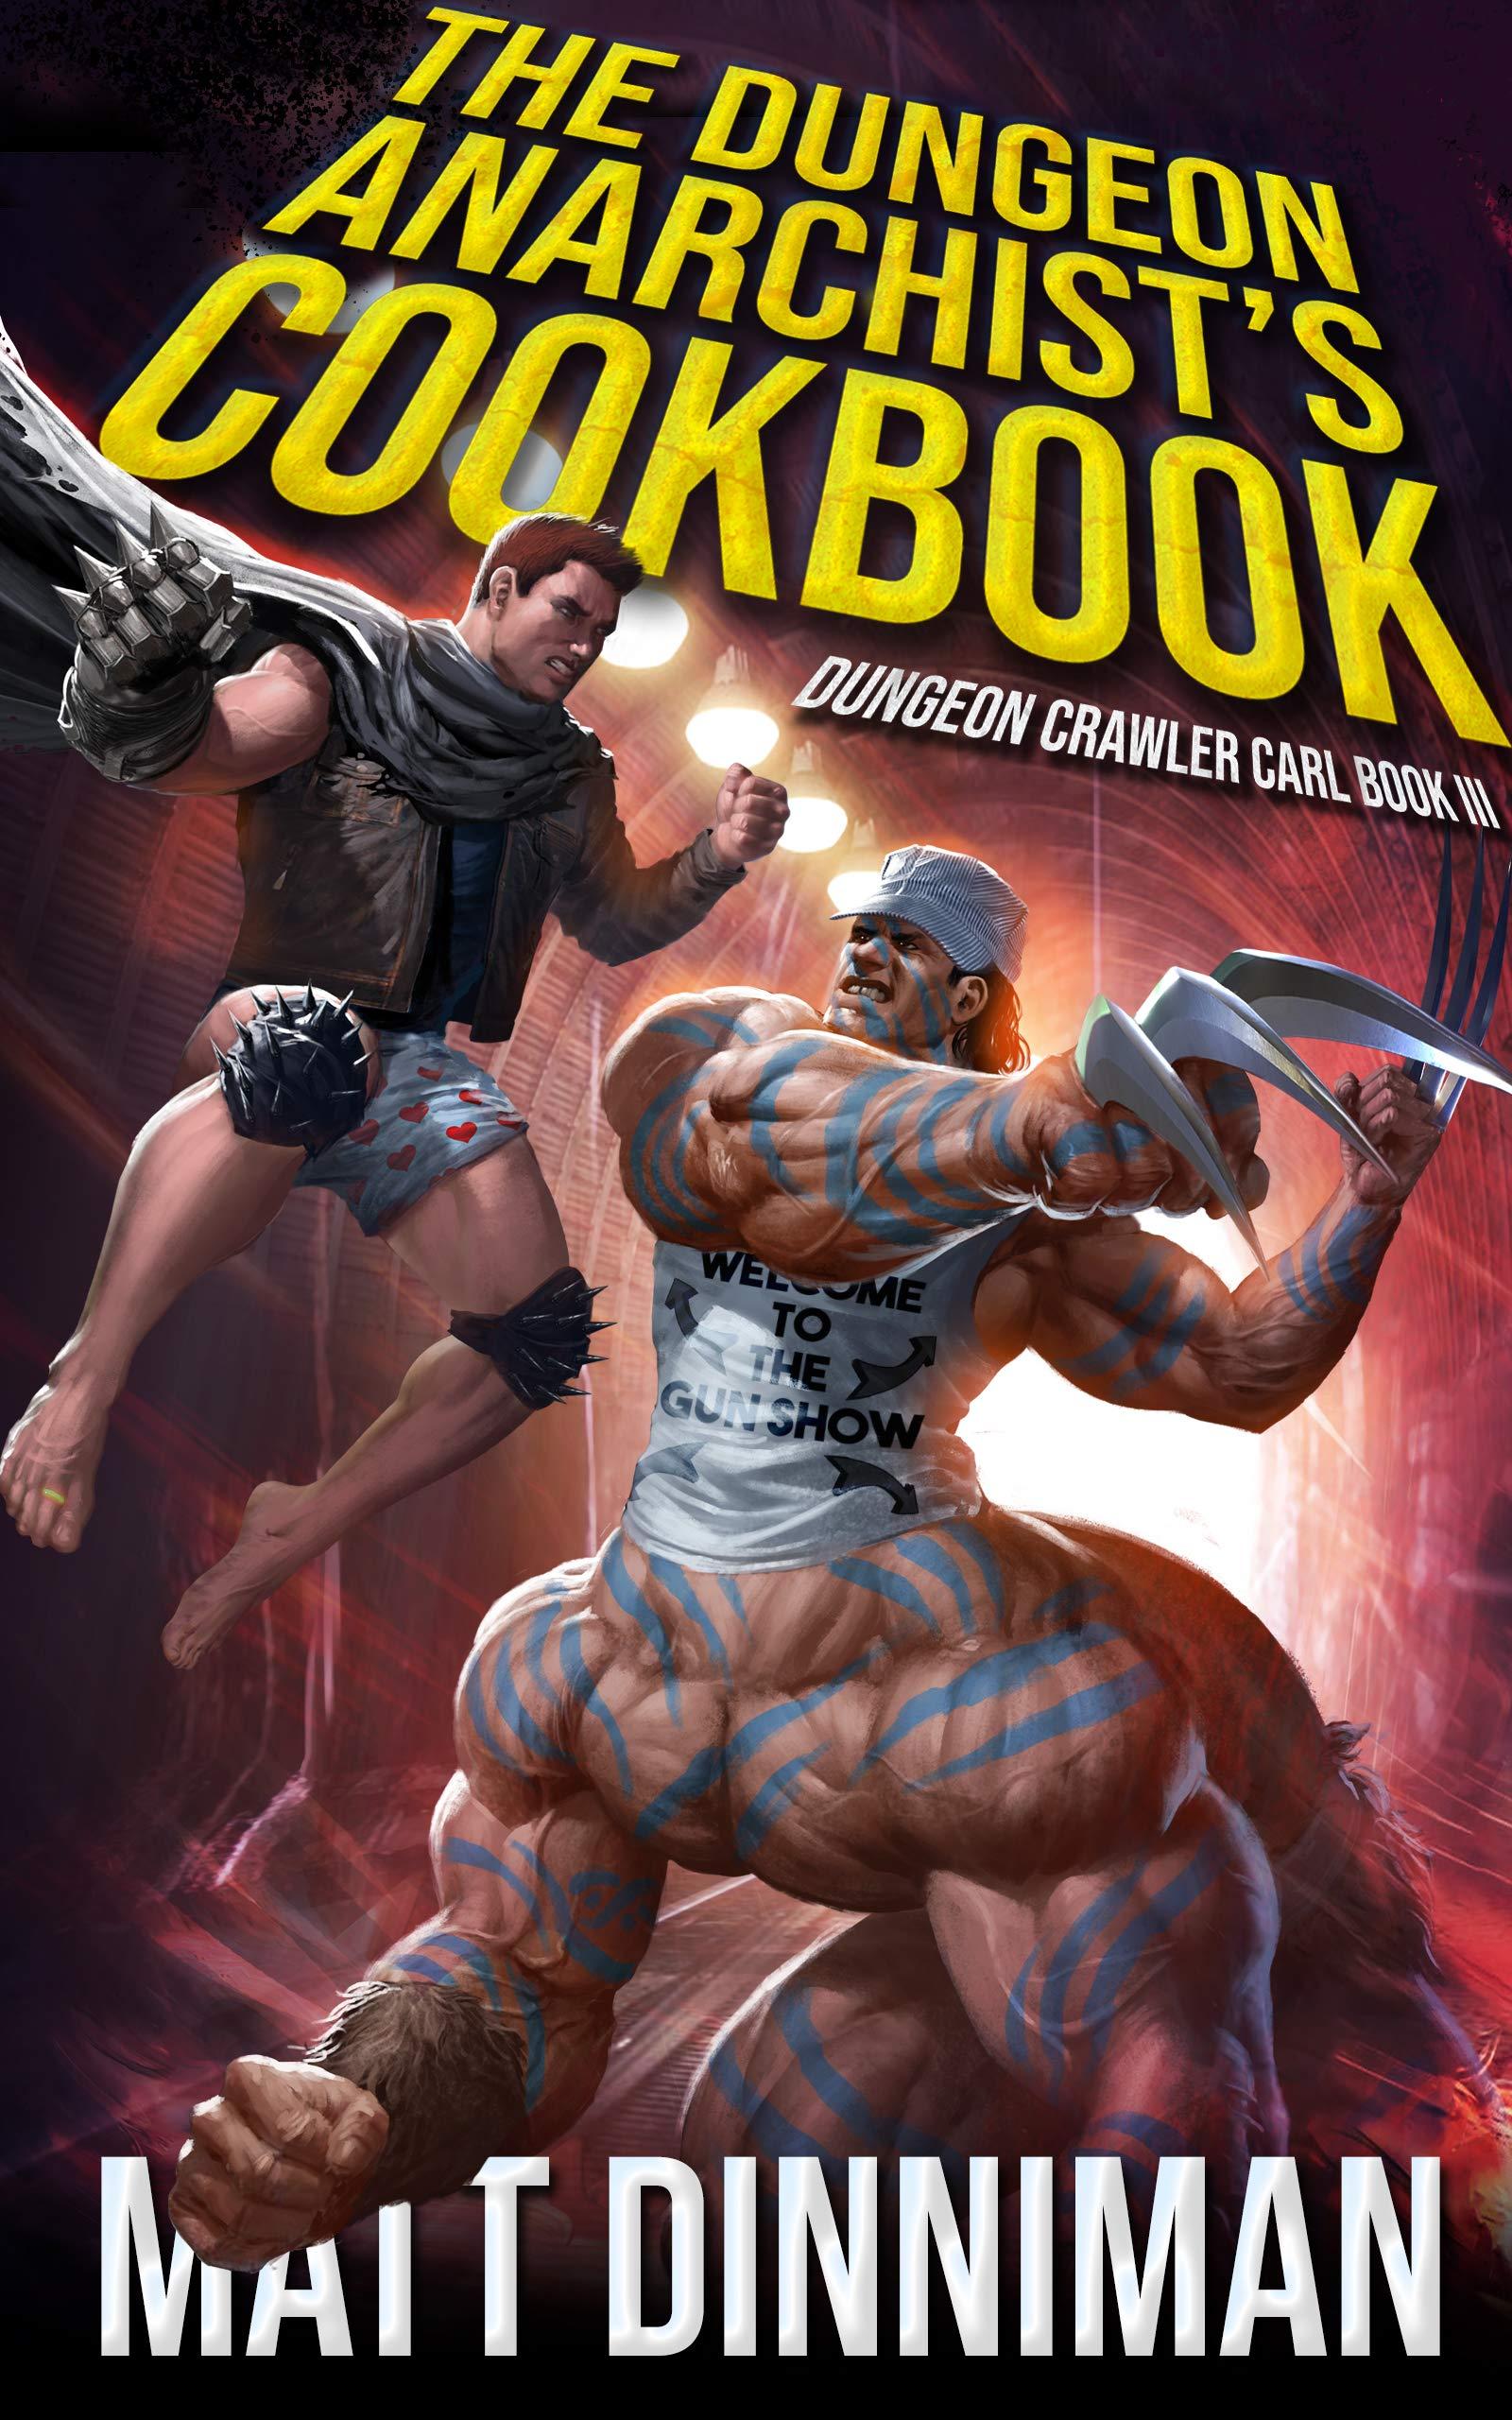 The Dungeon Anarchist's Cookbook: Dungeon Crawler Carl Book 3